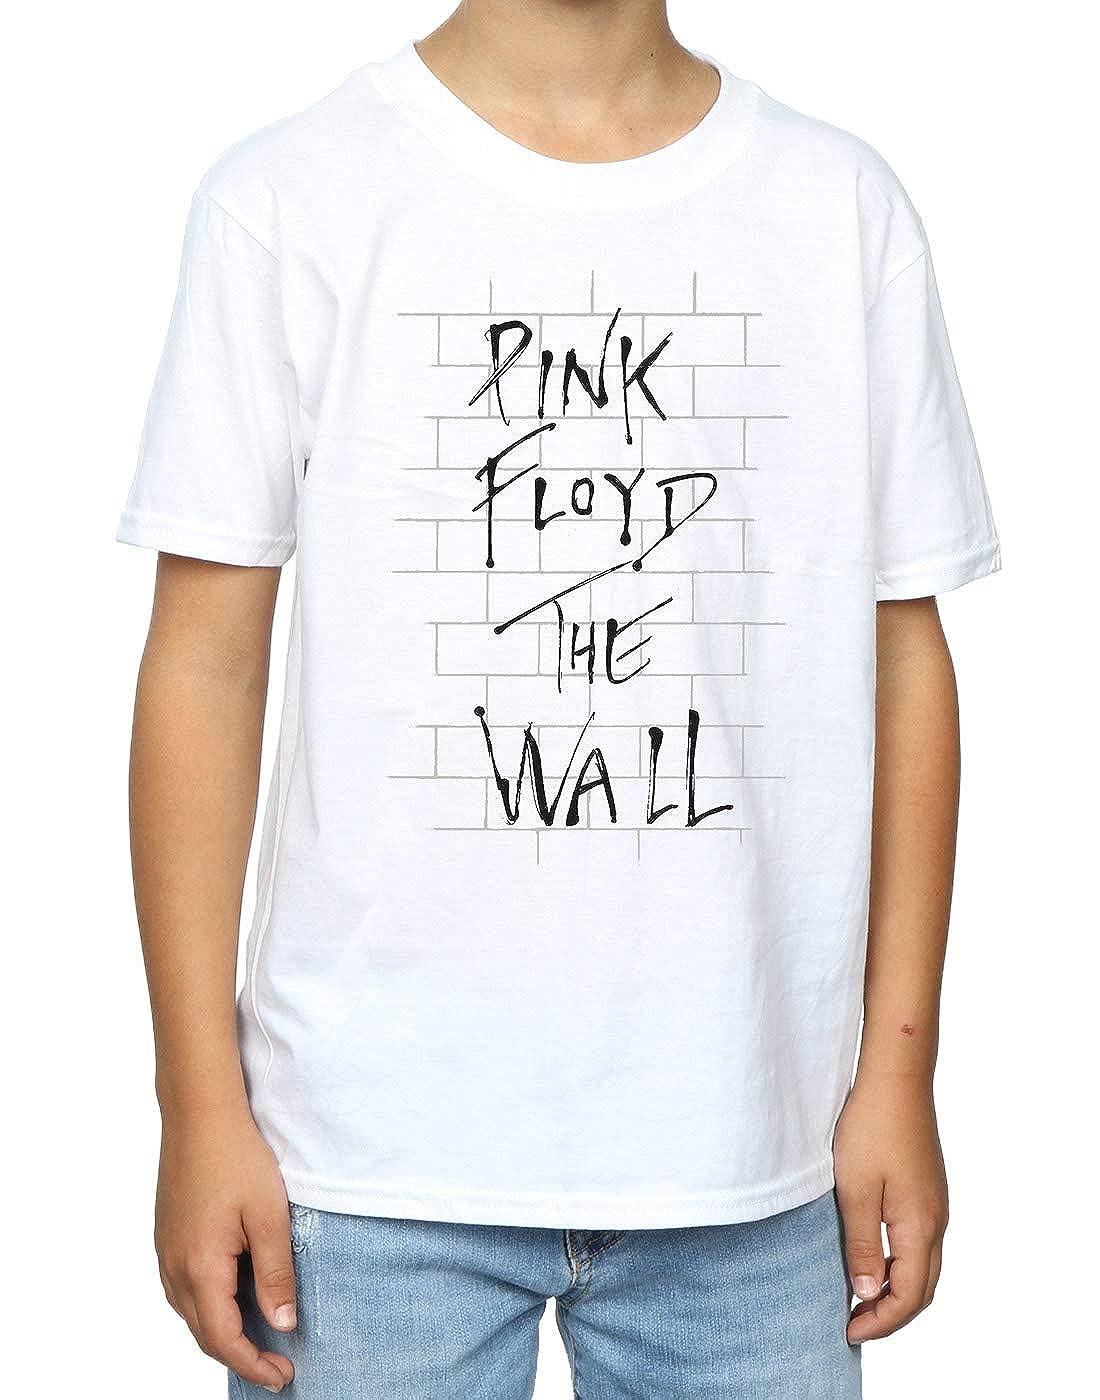 Camisetas Polos Y Camisas Pink Floyd Ninos The Wall Camiseta Ropa Brandknewmag Com